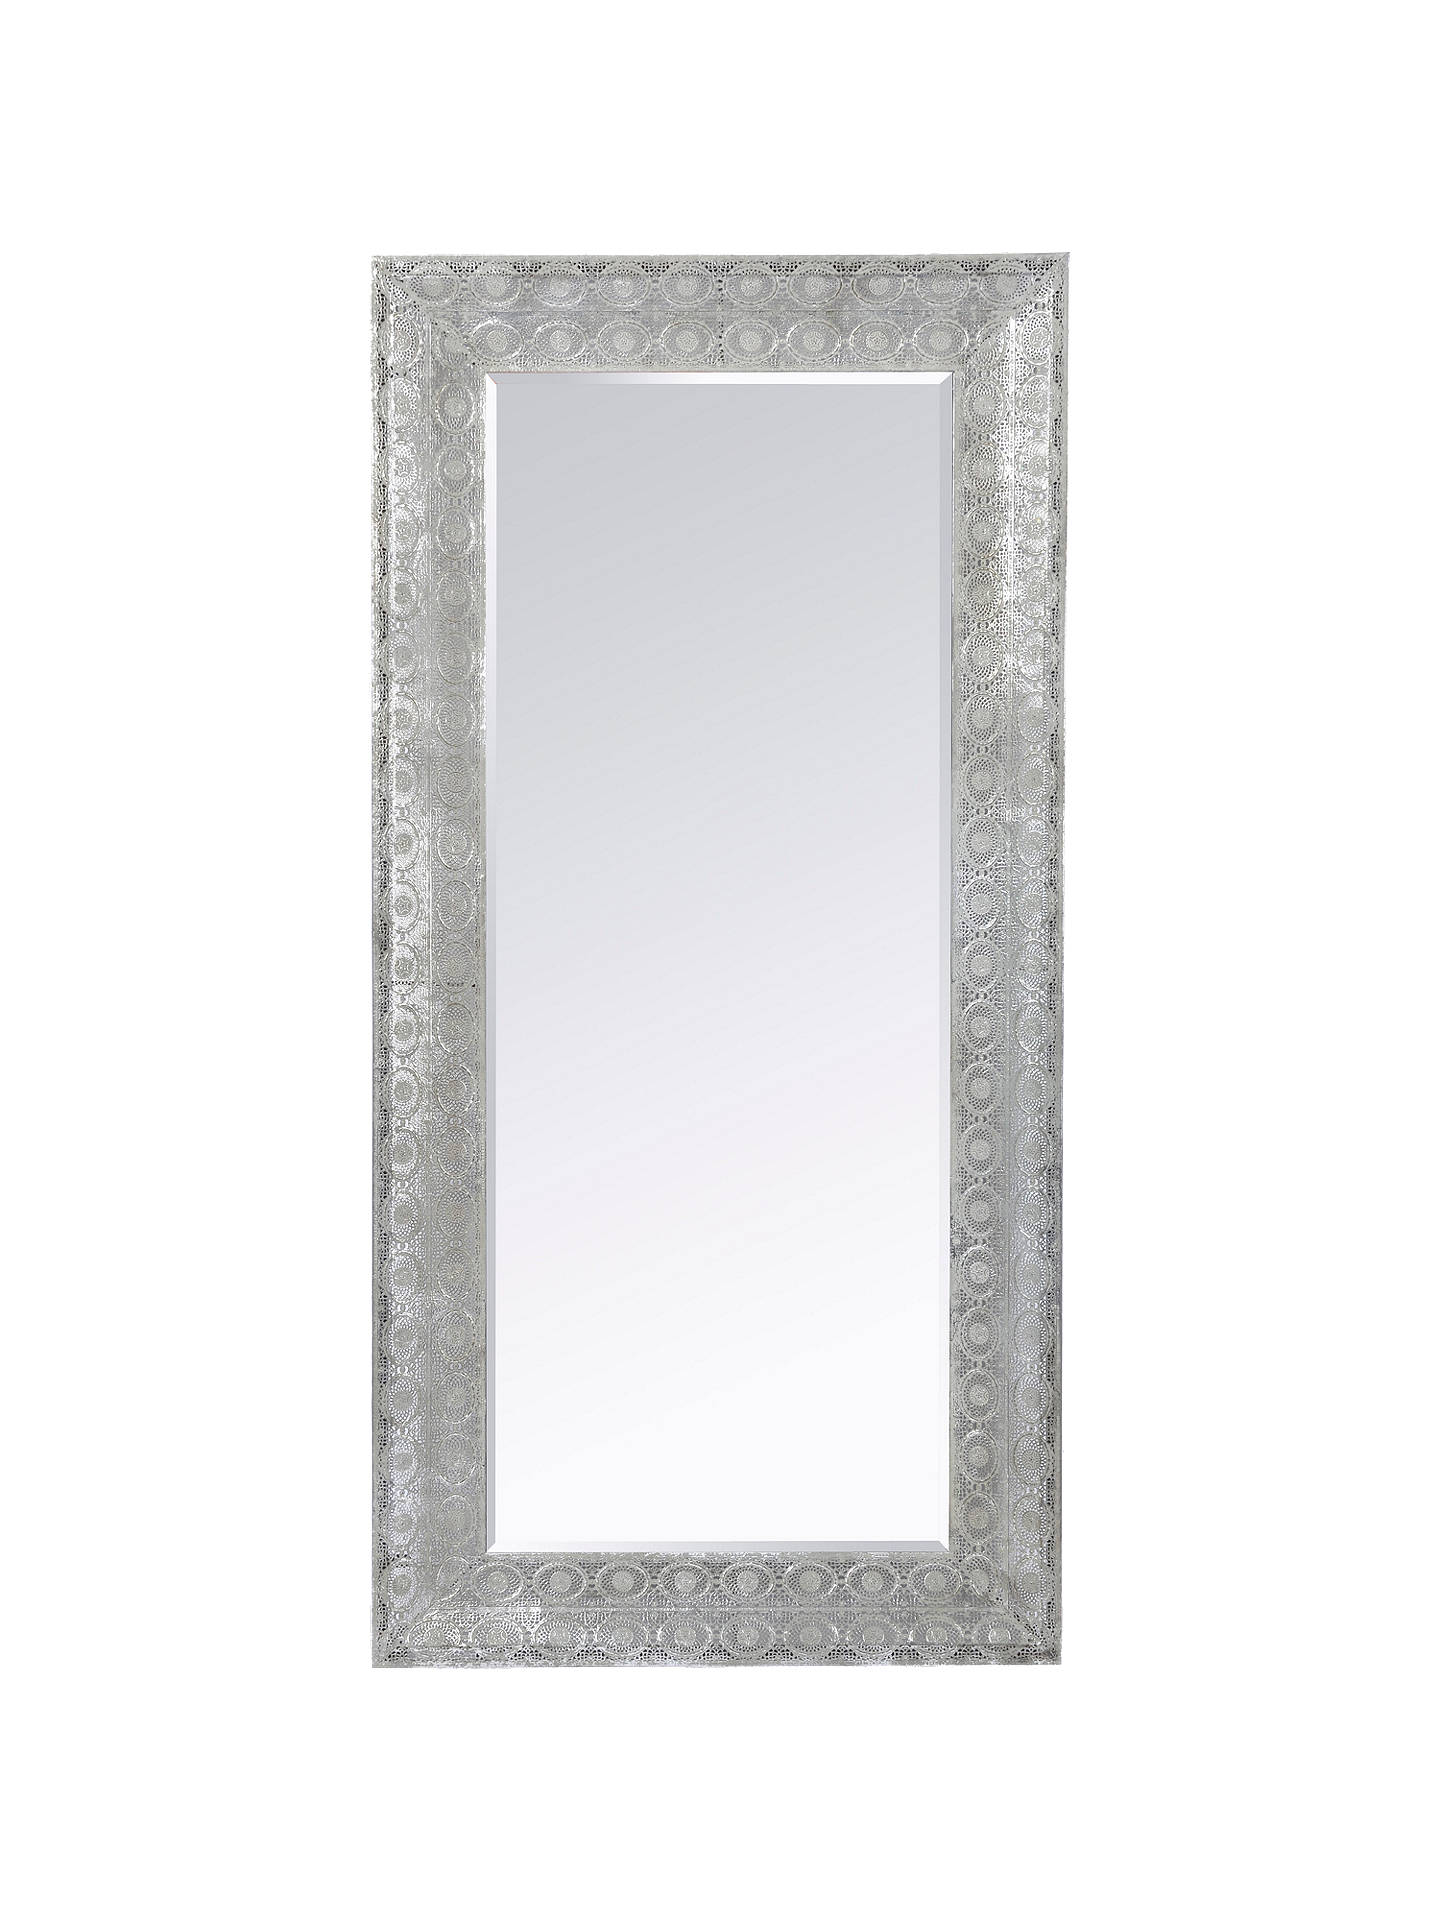 208db33a69b0 Buy Libra Filigree Large Leaner Mirror, Dark Grey, 165 x 80cm Online at  johnlewis ...